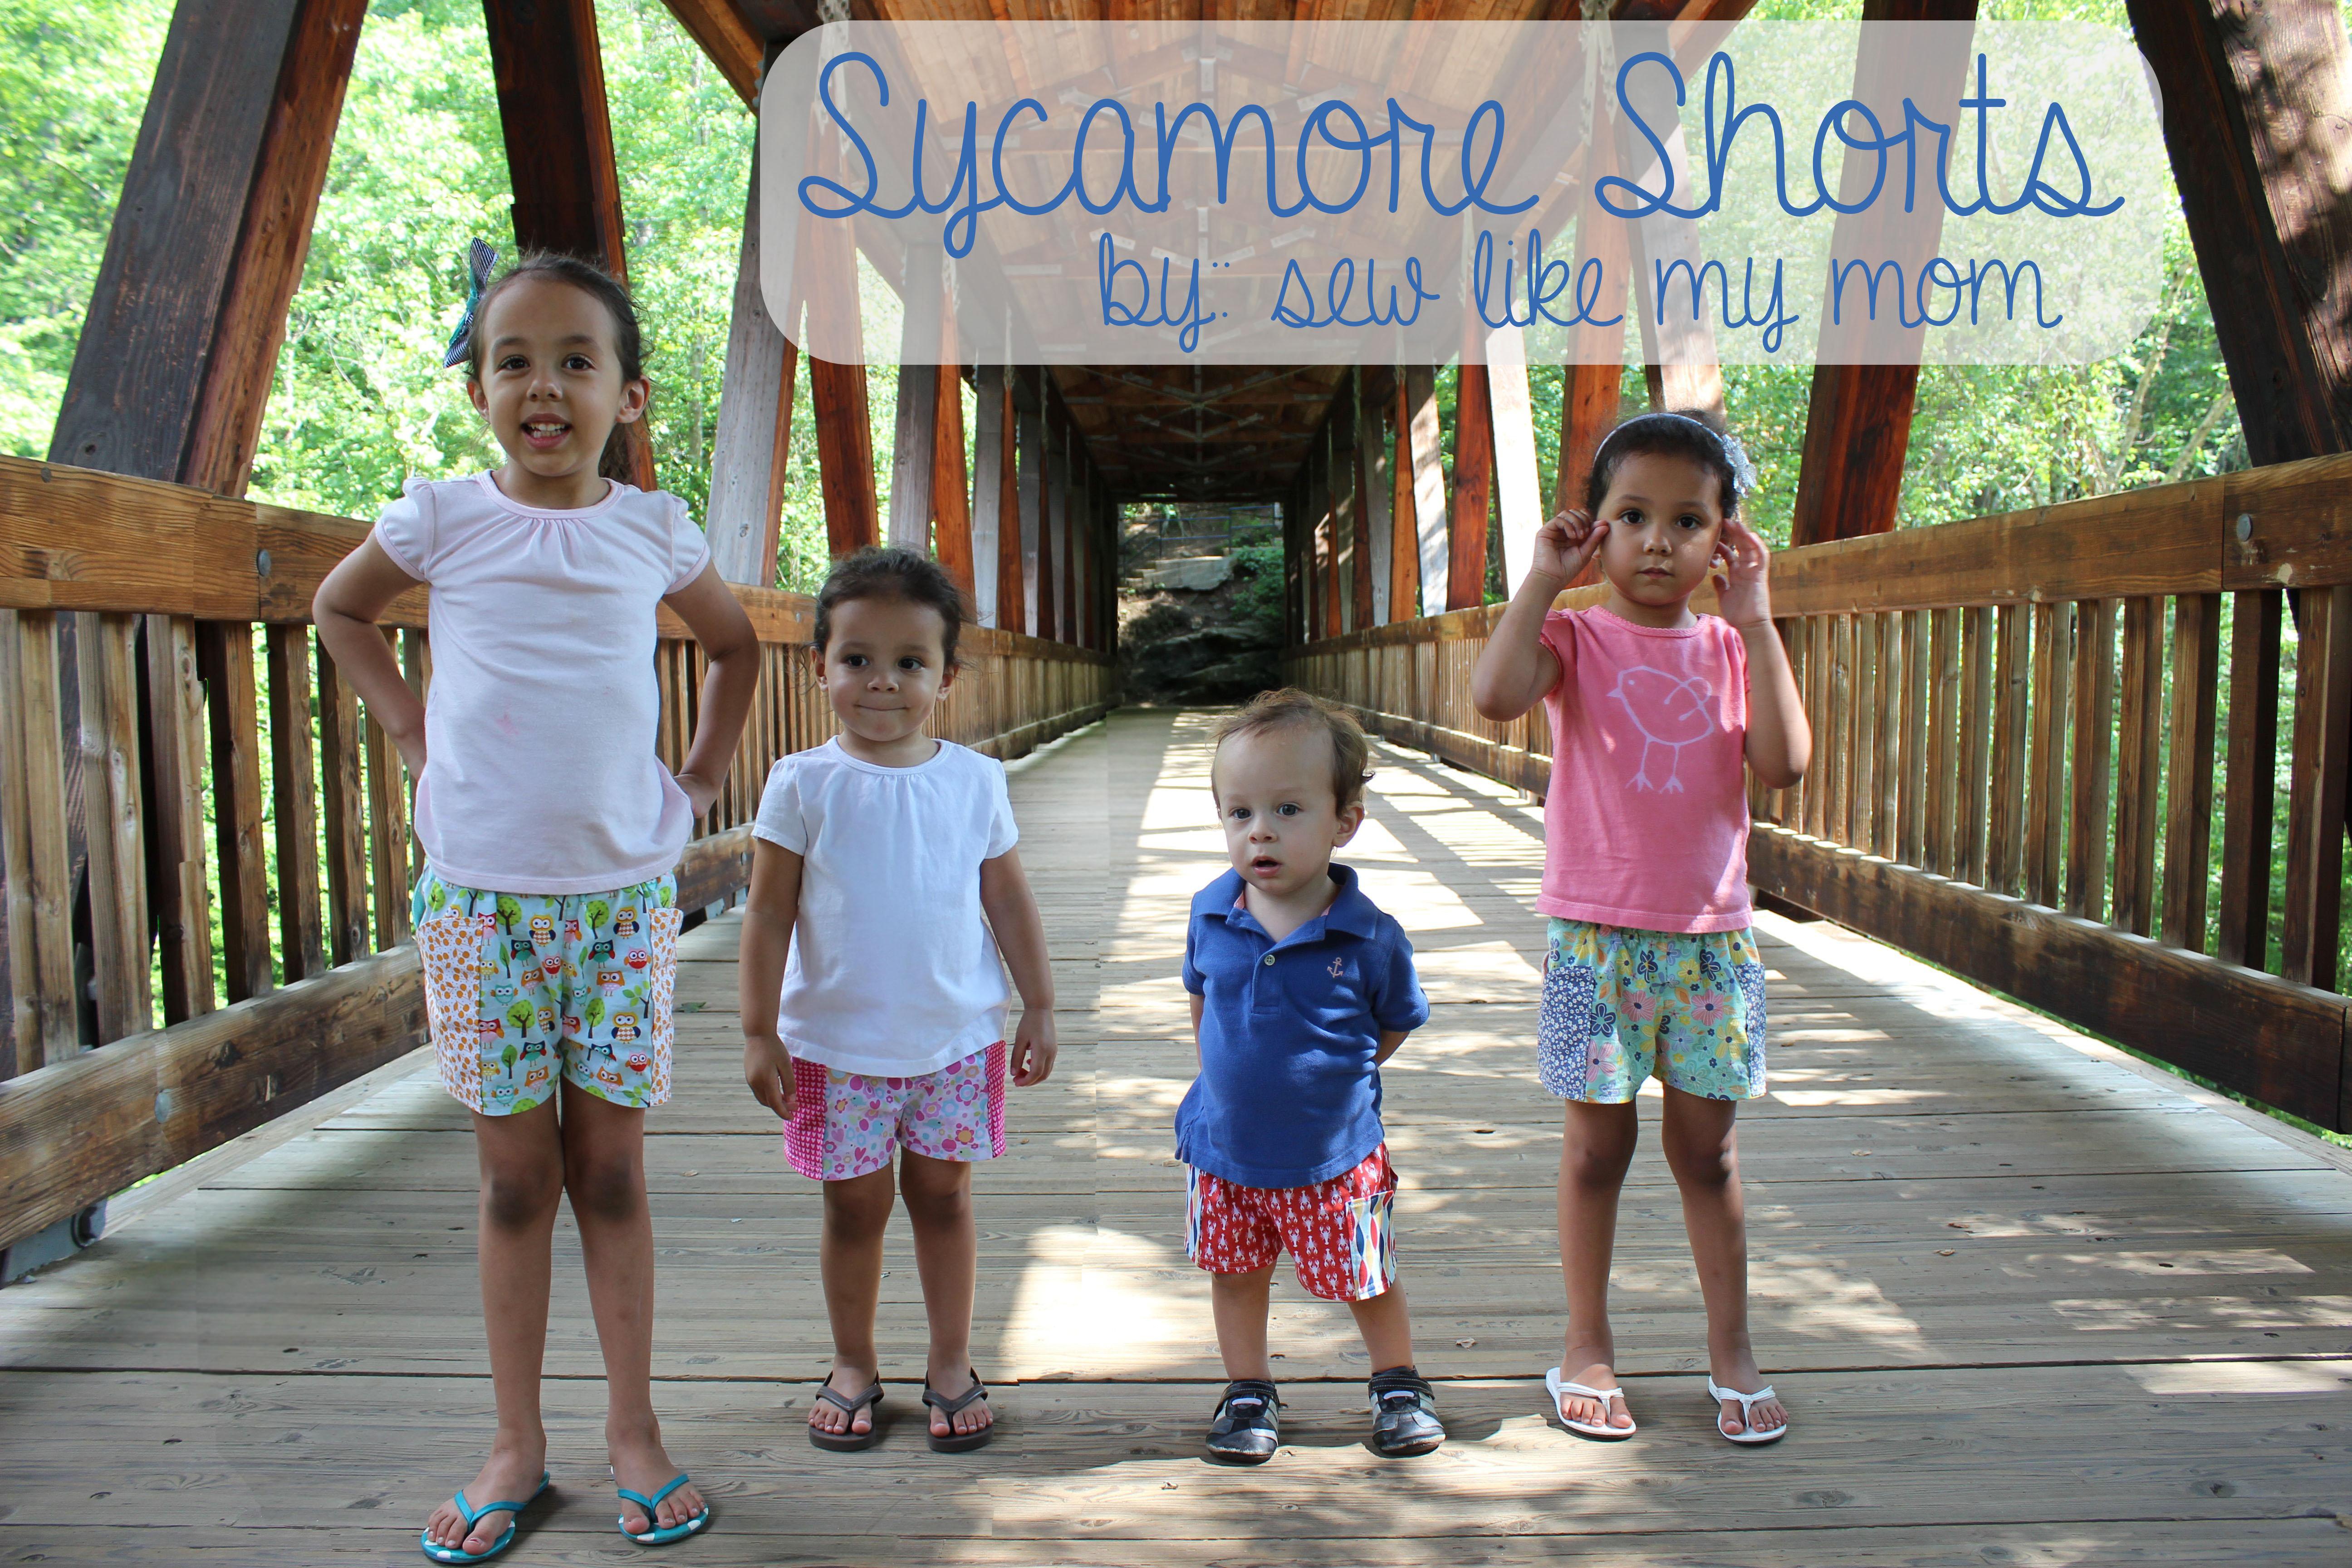 Sew Like My Mom | Sycamore Shorts